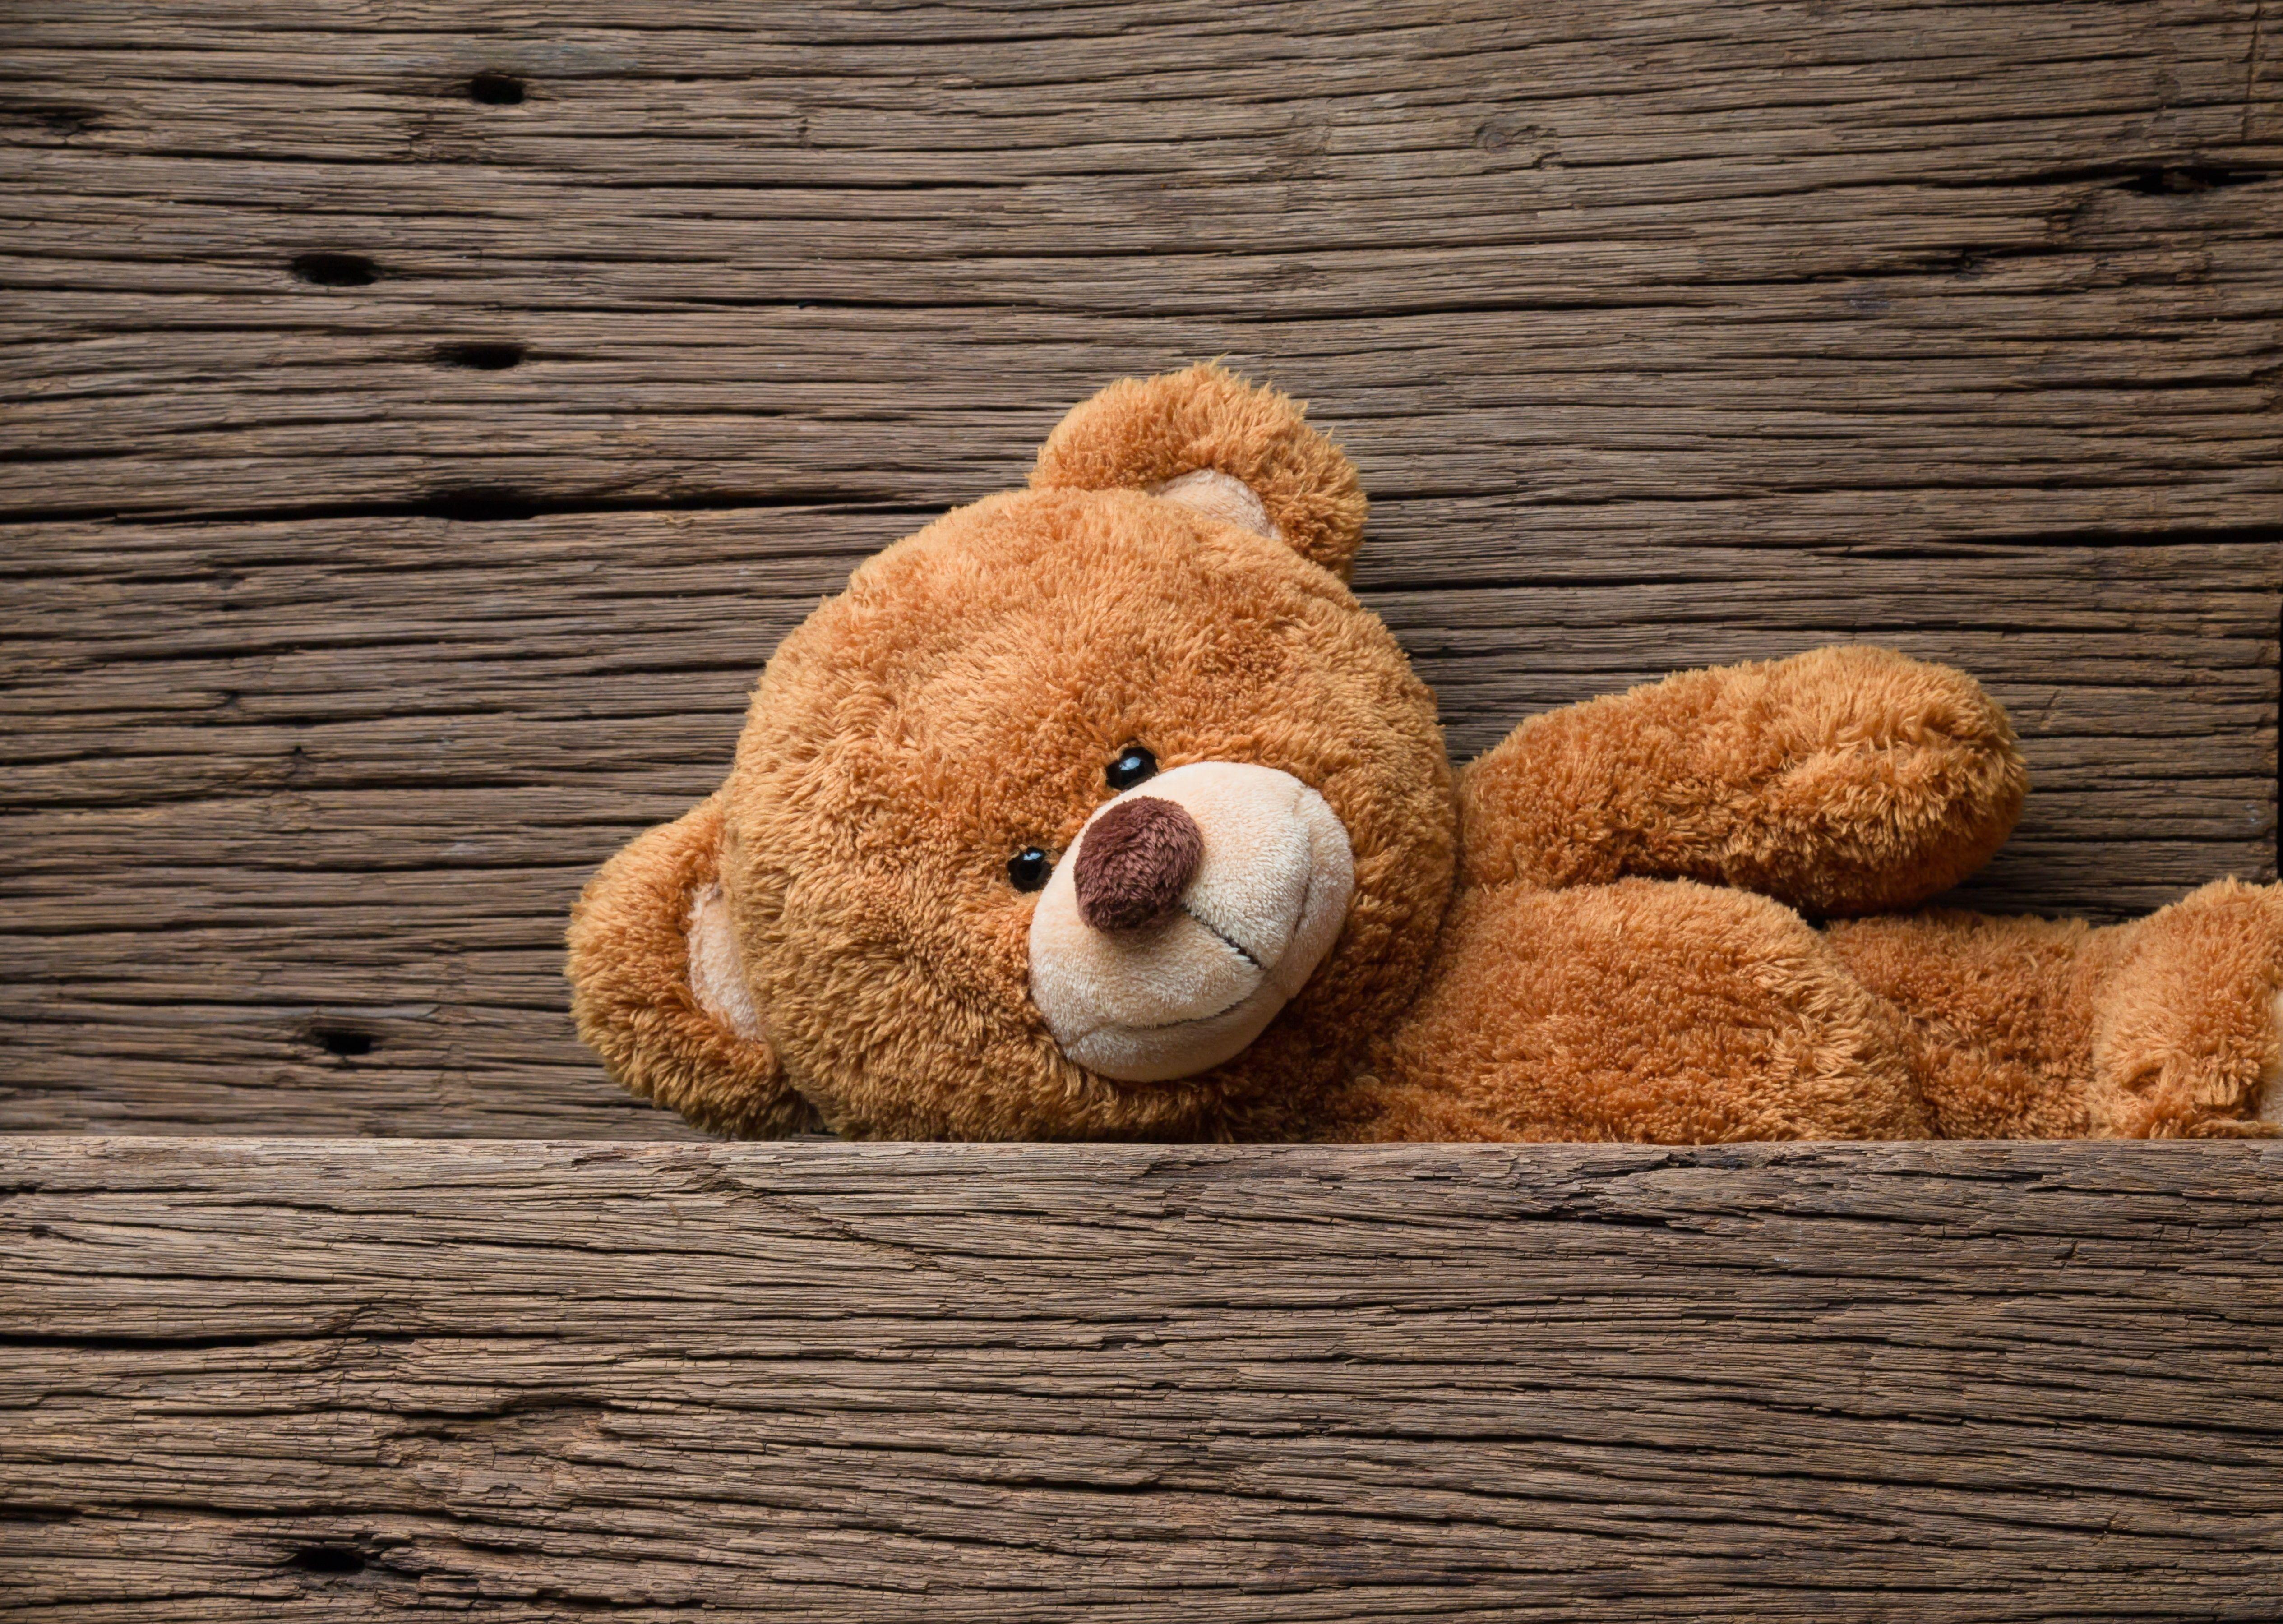 Toy Bear Bear Wood Teddy Bear Cute 4k Wallpaper Hdwallpaper Desktop Teddy Bear Wallpaper Teddy Bear Teddy Bear Pictures